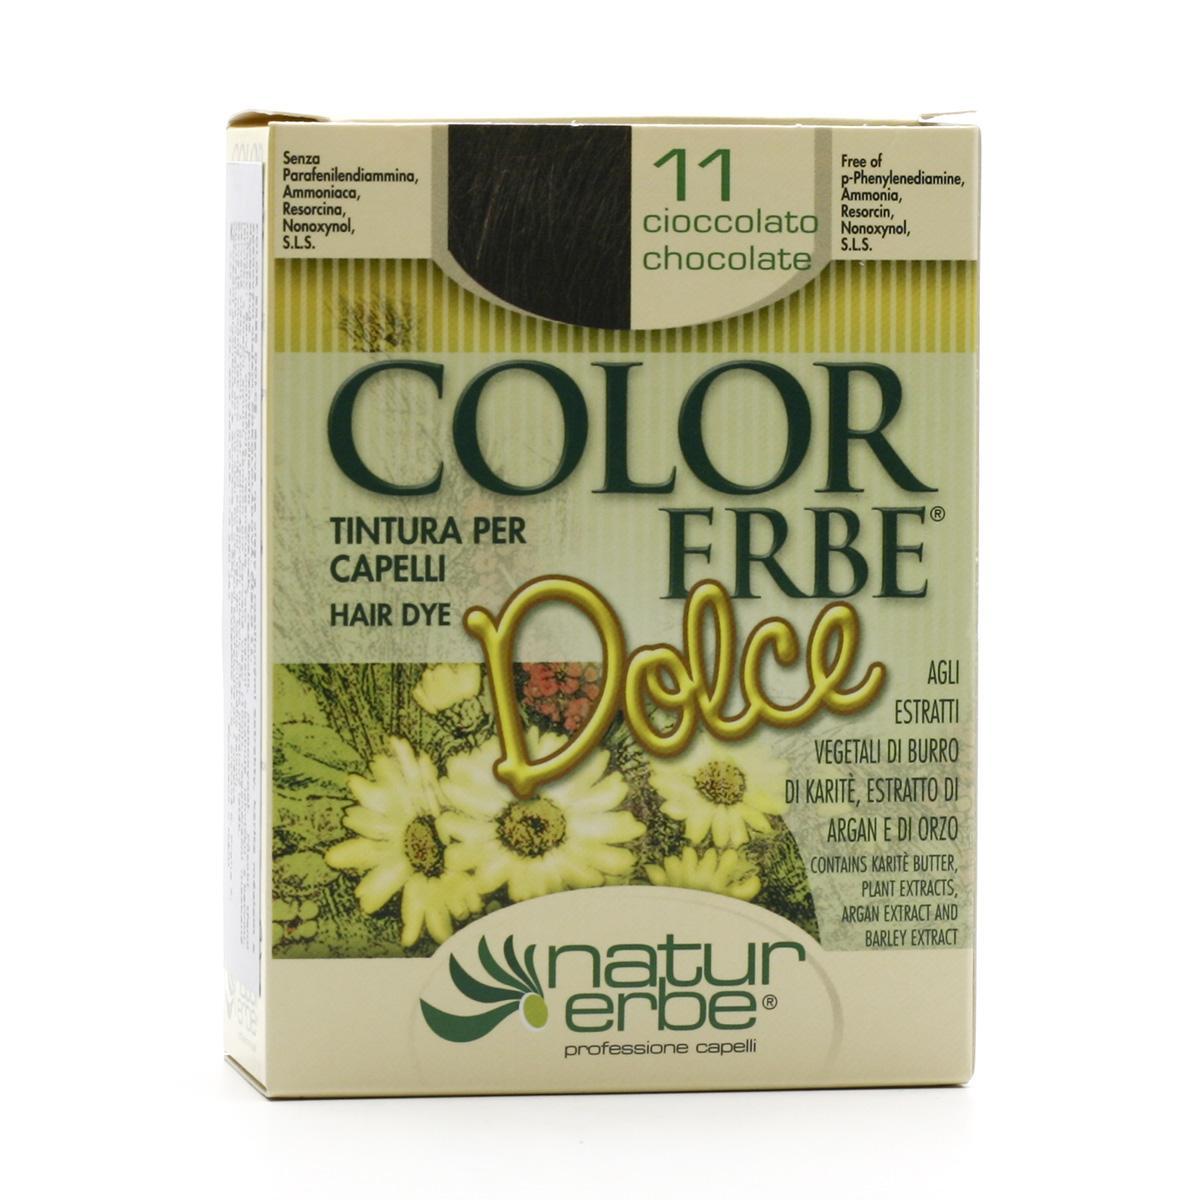 Color Erbe Barva na vlasy Čokoládová 11, Dolce 135 ml